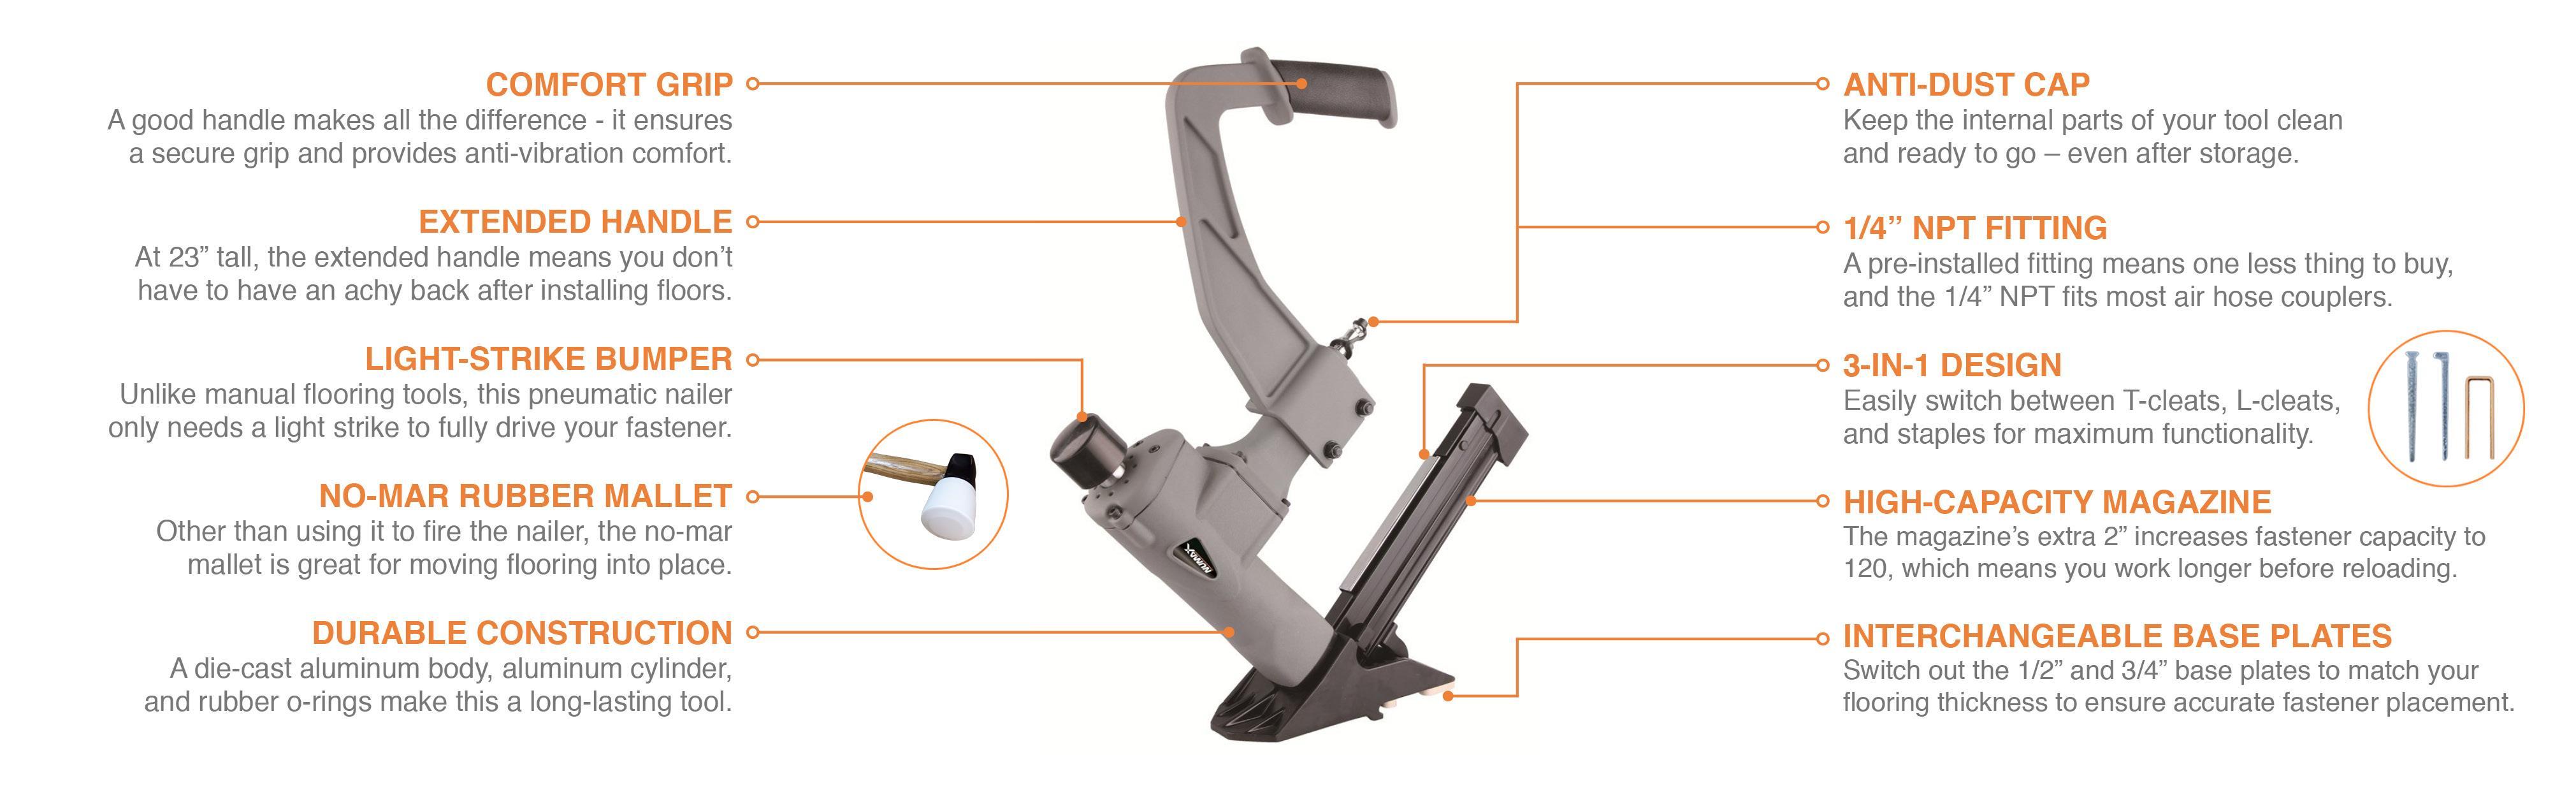 Numax Sfl618 3 In 1 Pneumatic Flooring Stapler Nailer Switch Light Fitting View Larger